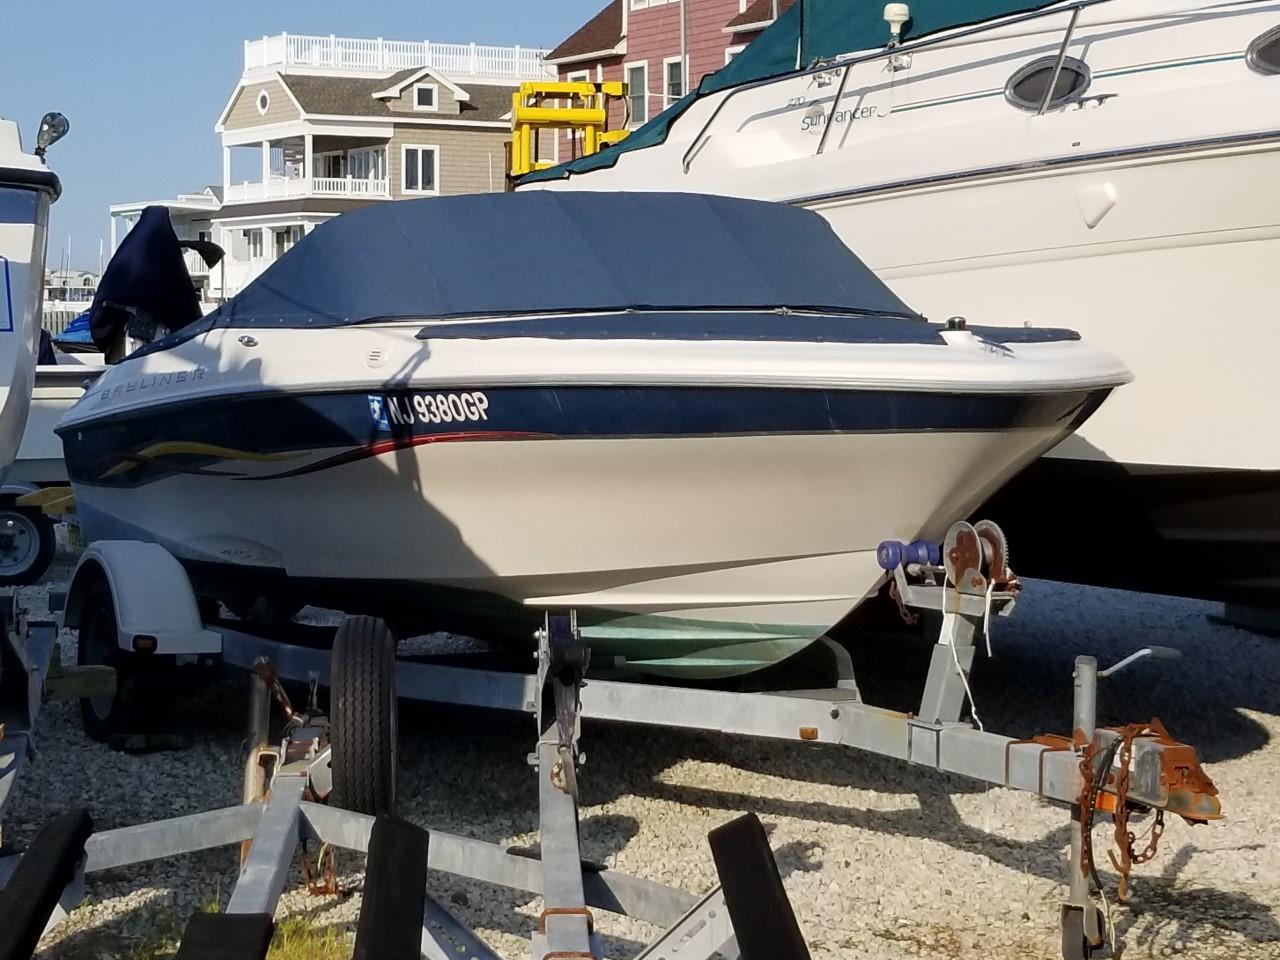 medium resolution of 2001 bayliner 185 capri power boat for sale www yachtworld com rh yachtworld com 1996 bayliner